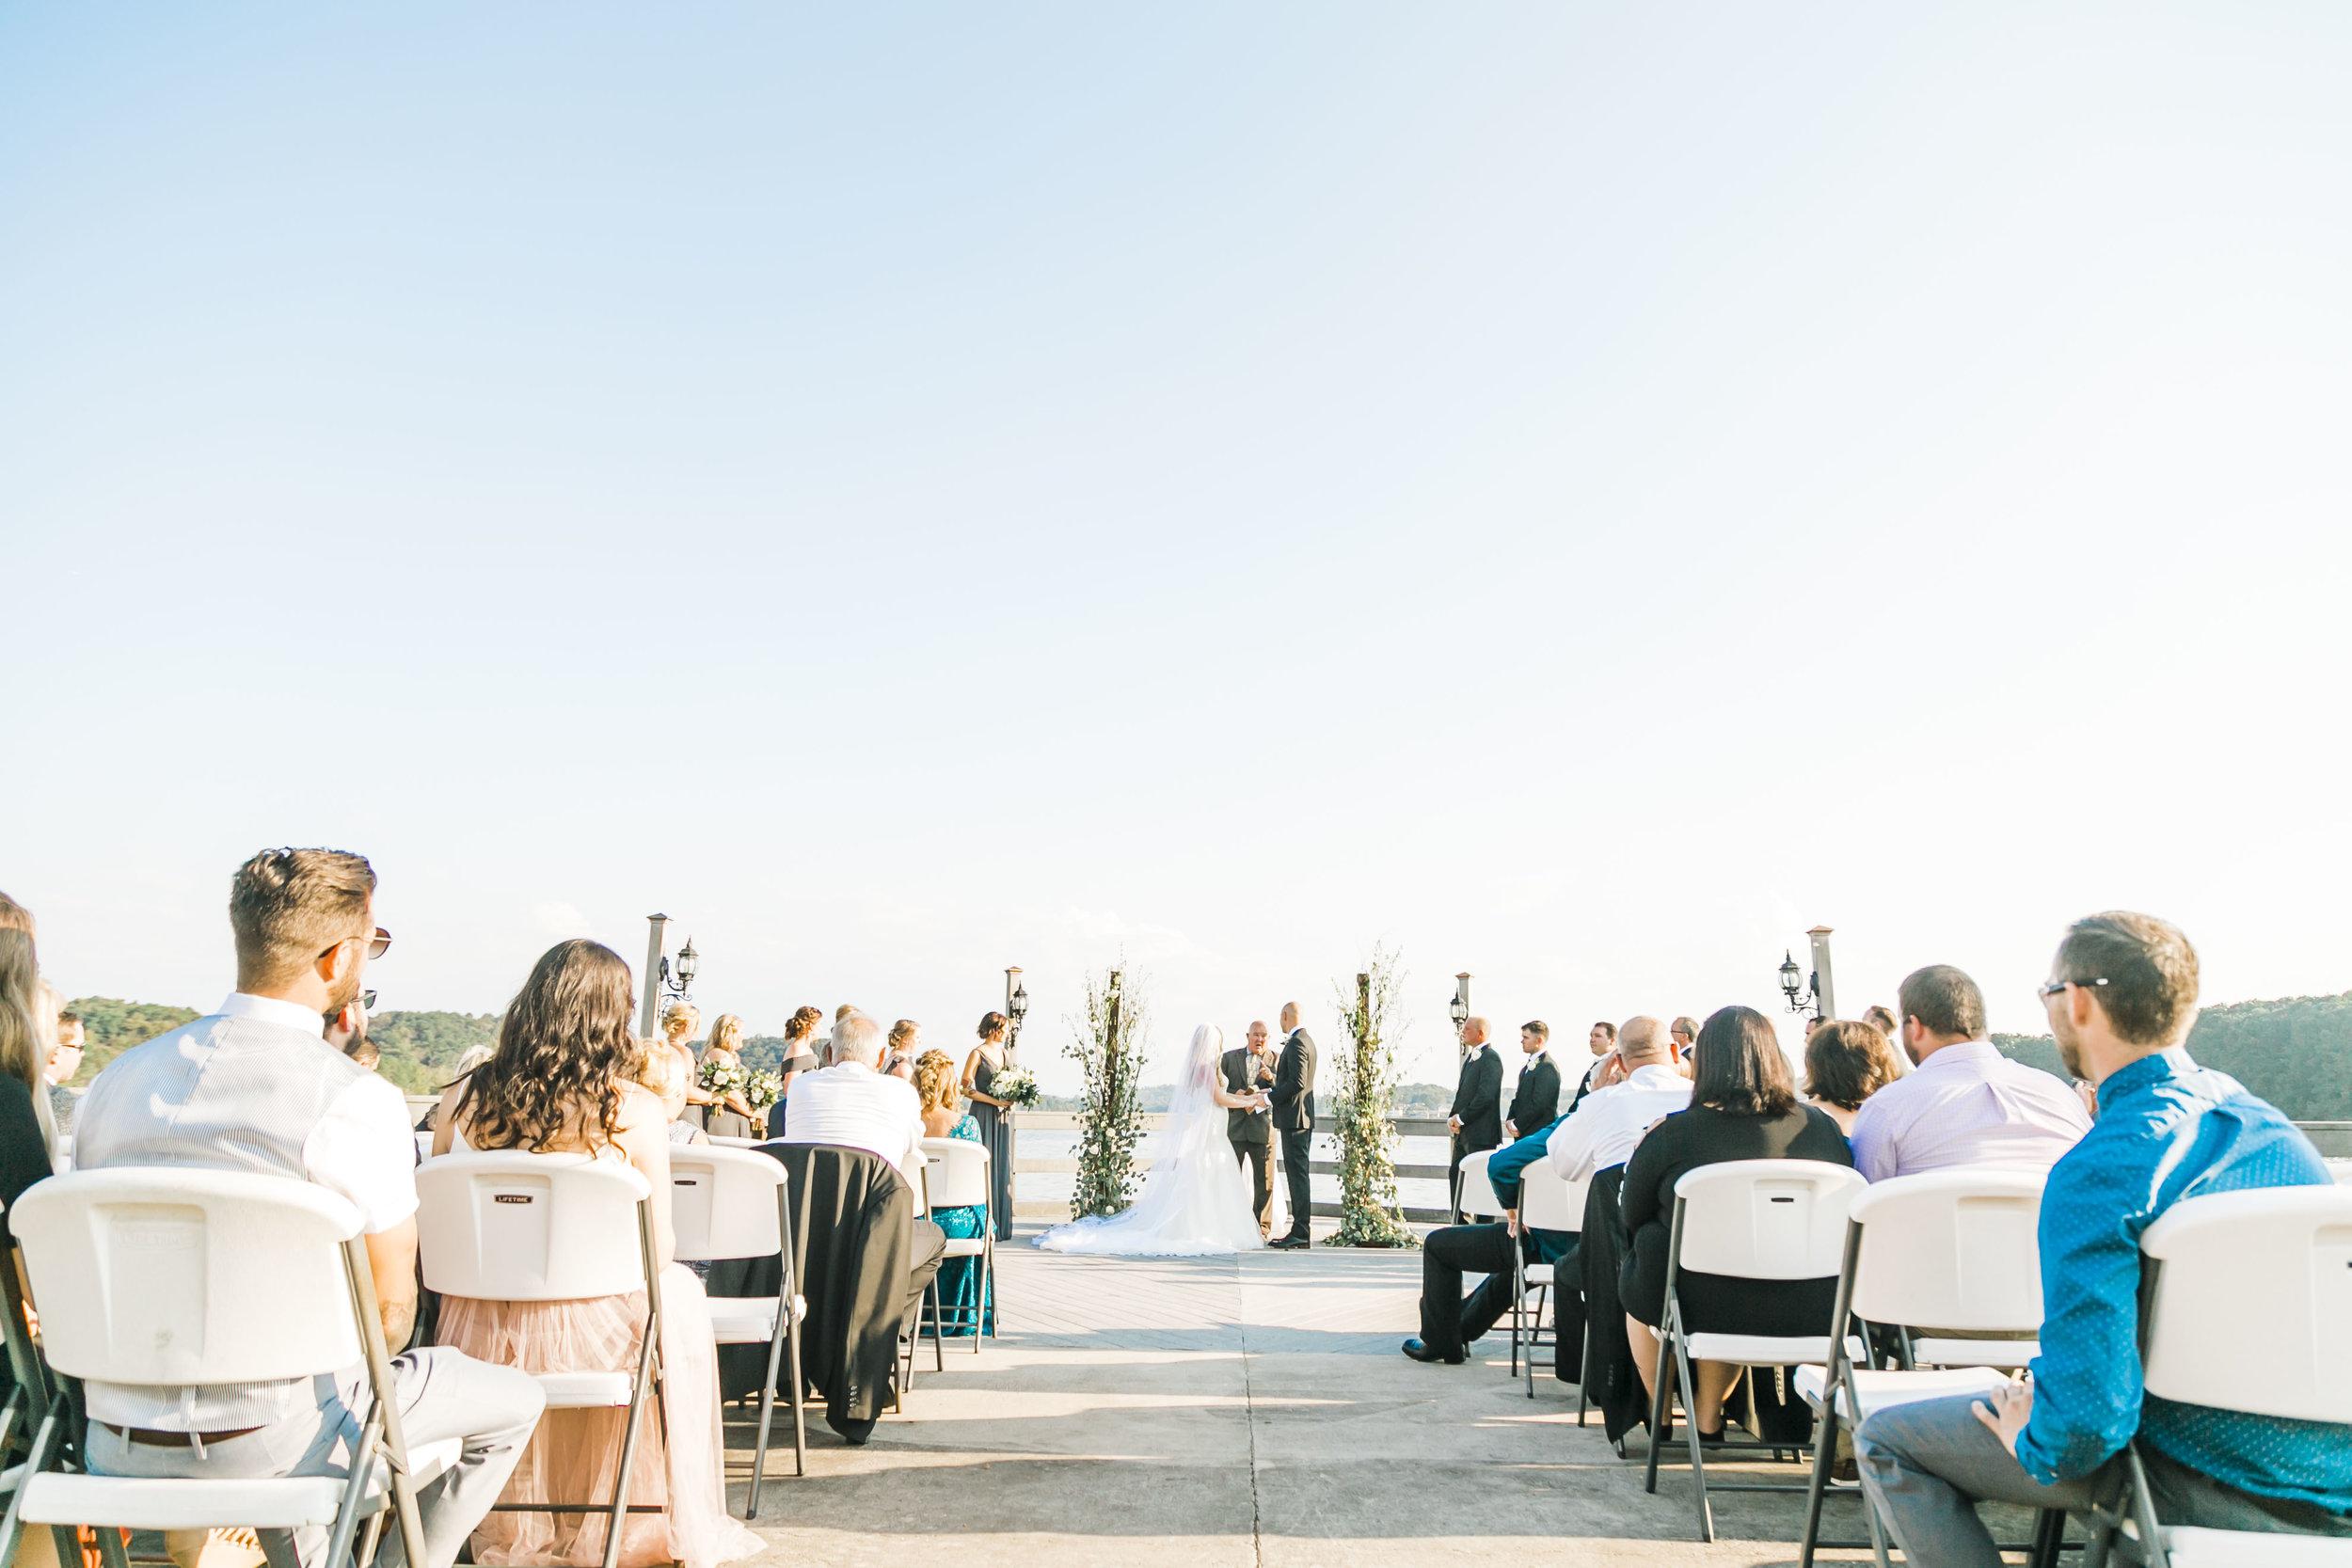 tellico village pier outdoor wedding